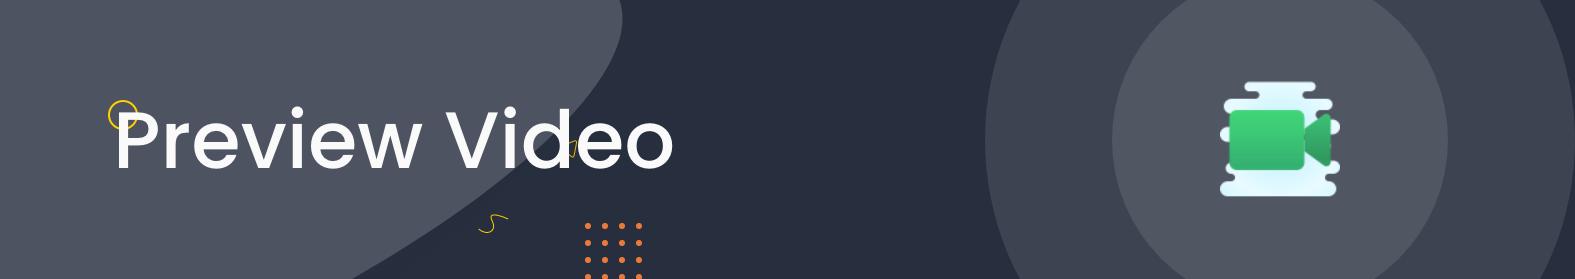 DellyShop E-Commerce App   Xamarin Forms - 5